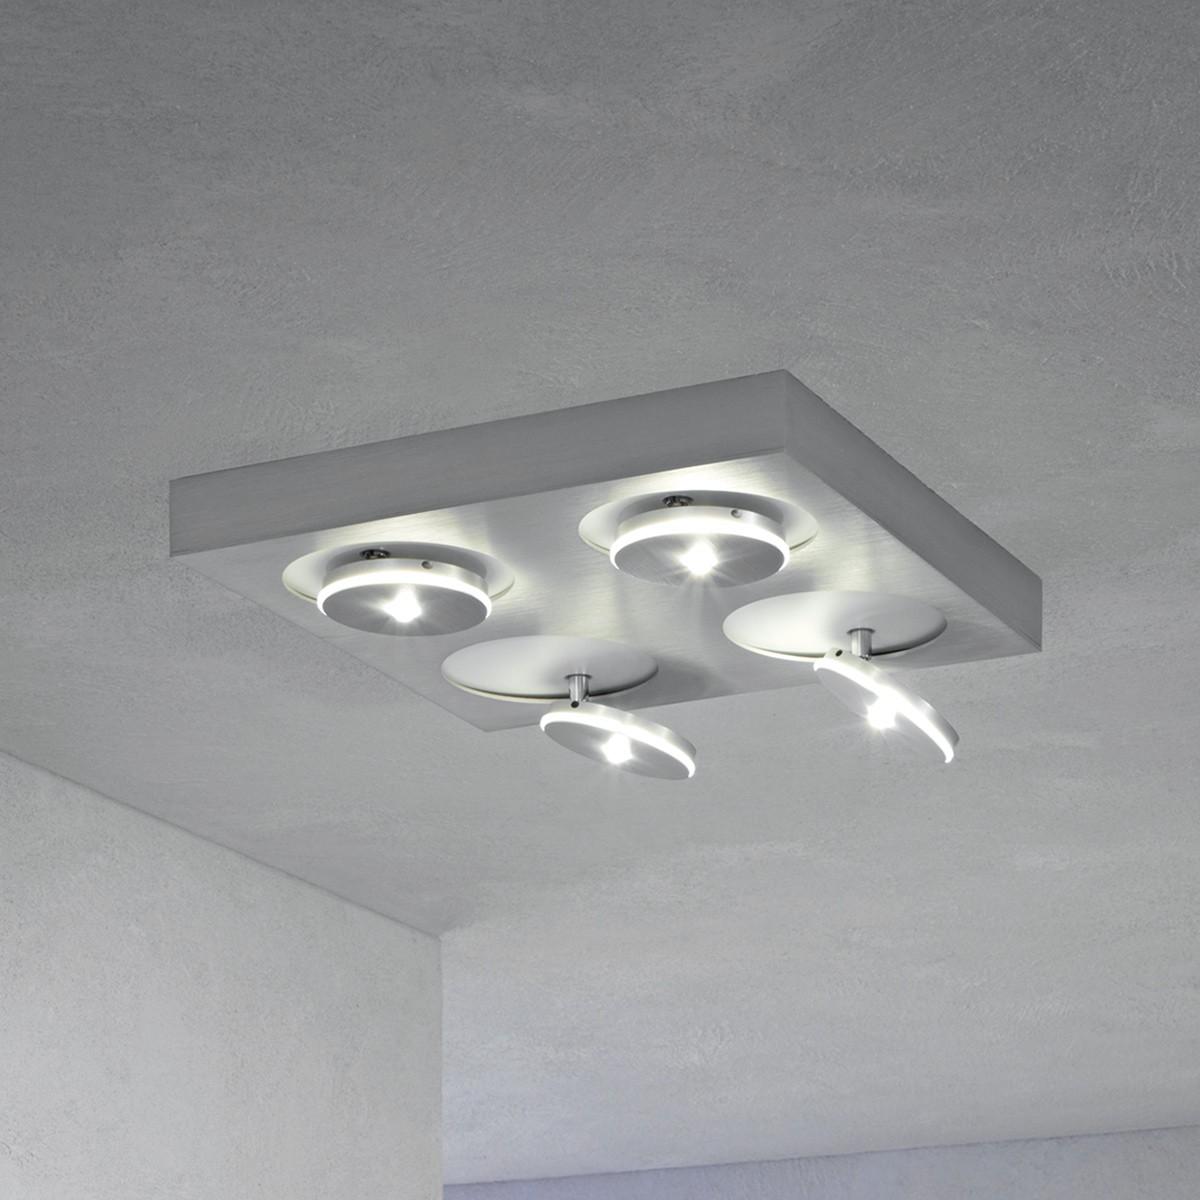 Escale Spot It LED Deckenleuchte, quadratisch, 4-flg., Aluminium geschliffen